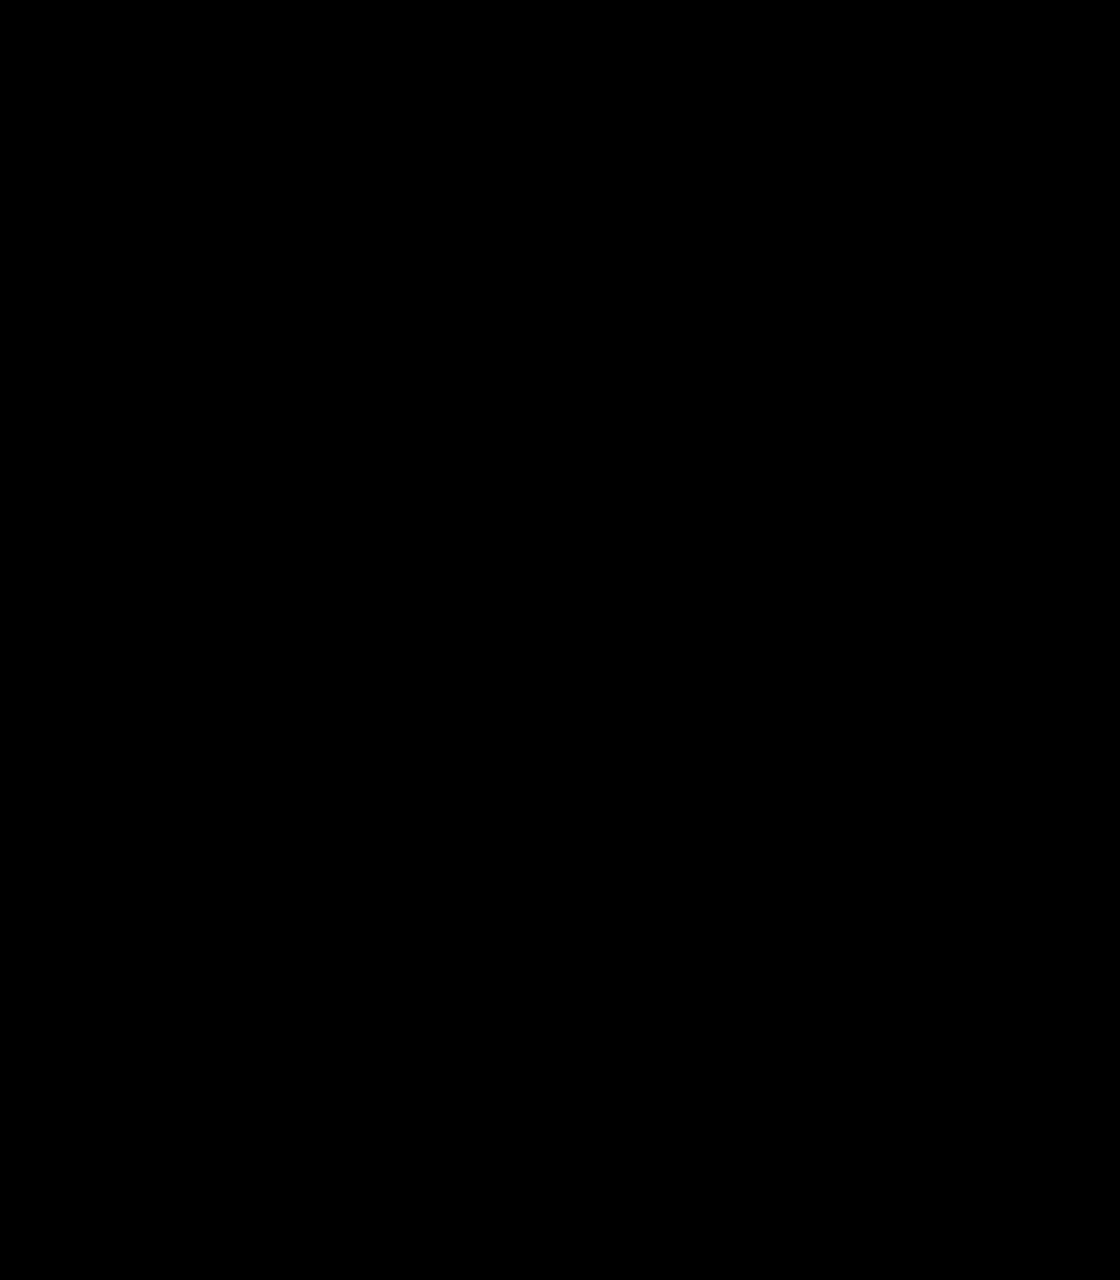 Girl Silhouette SVG Cut File